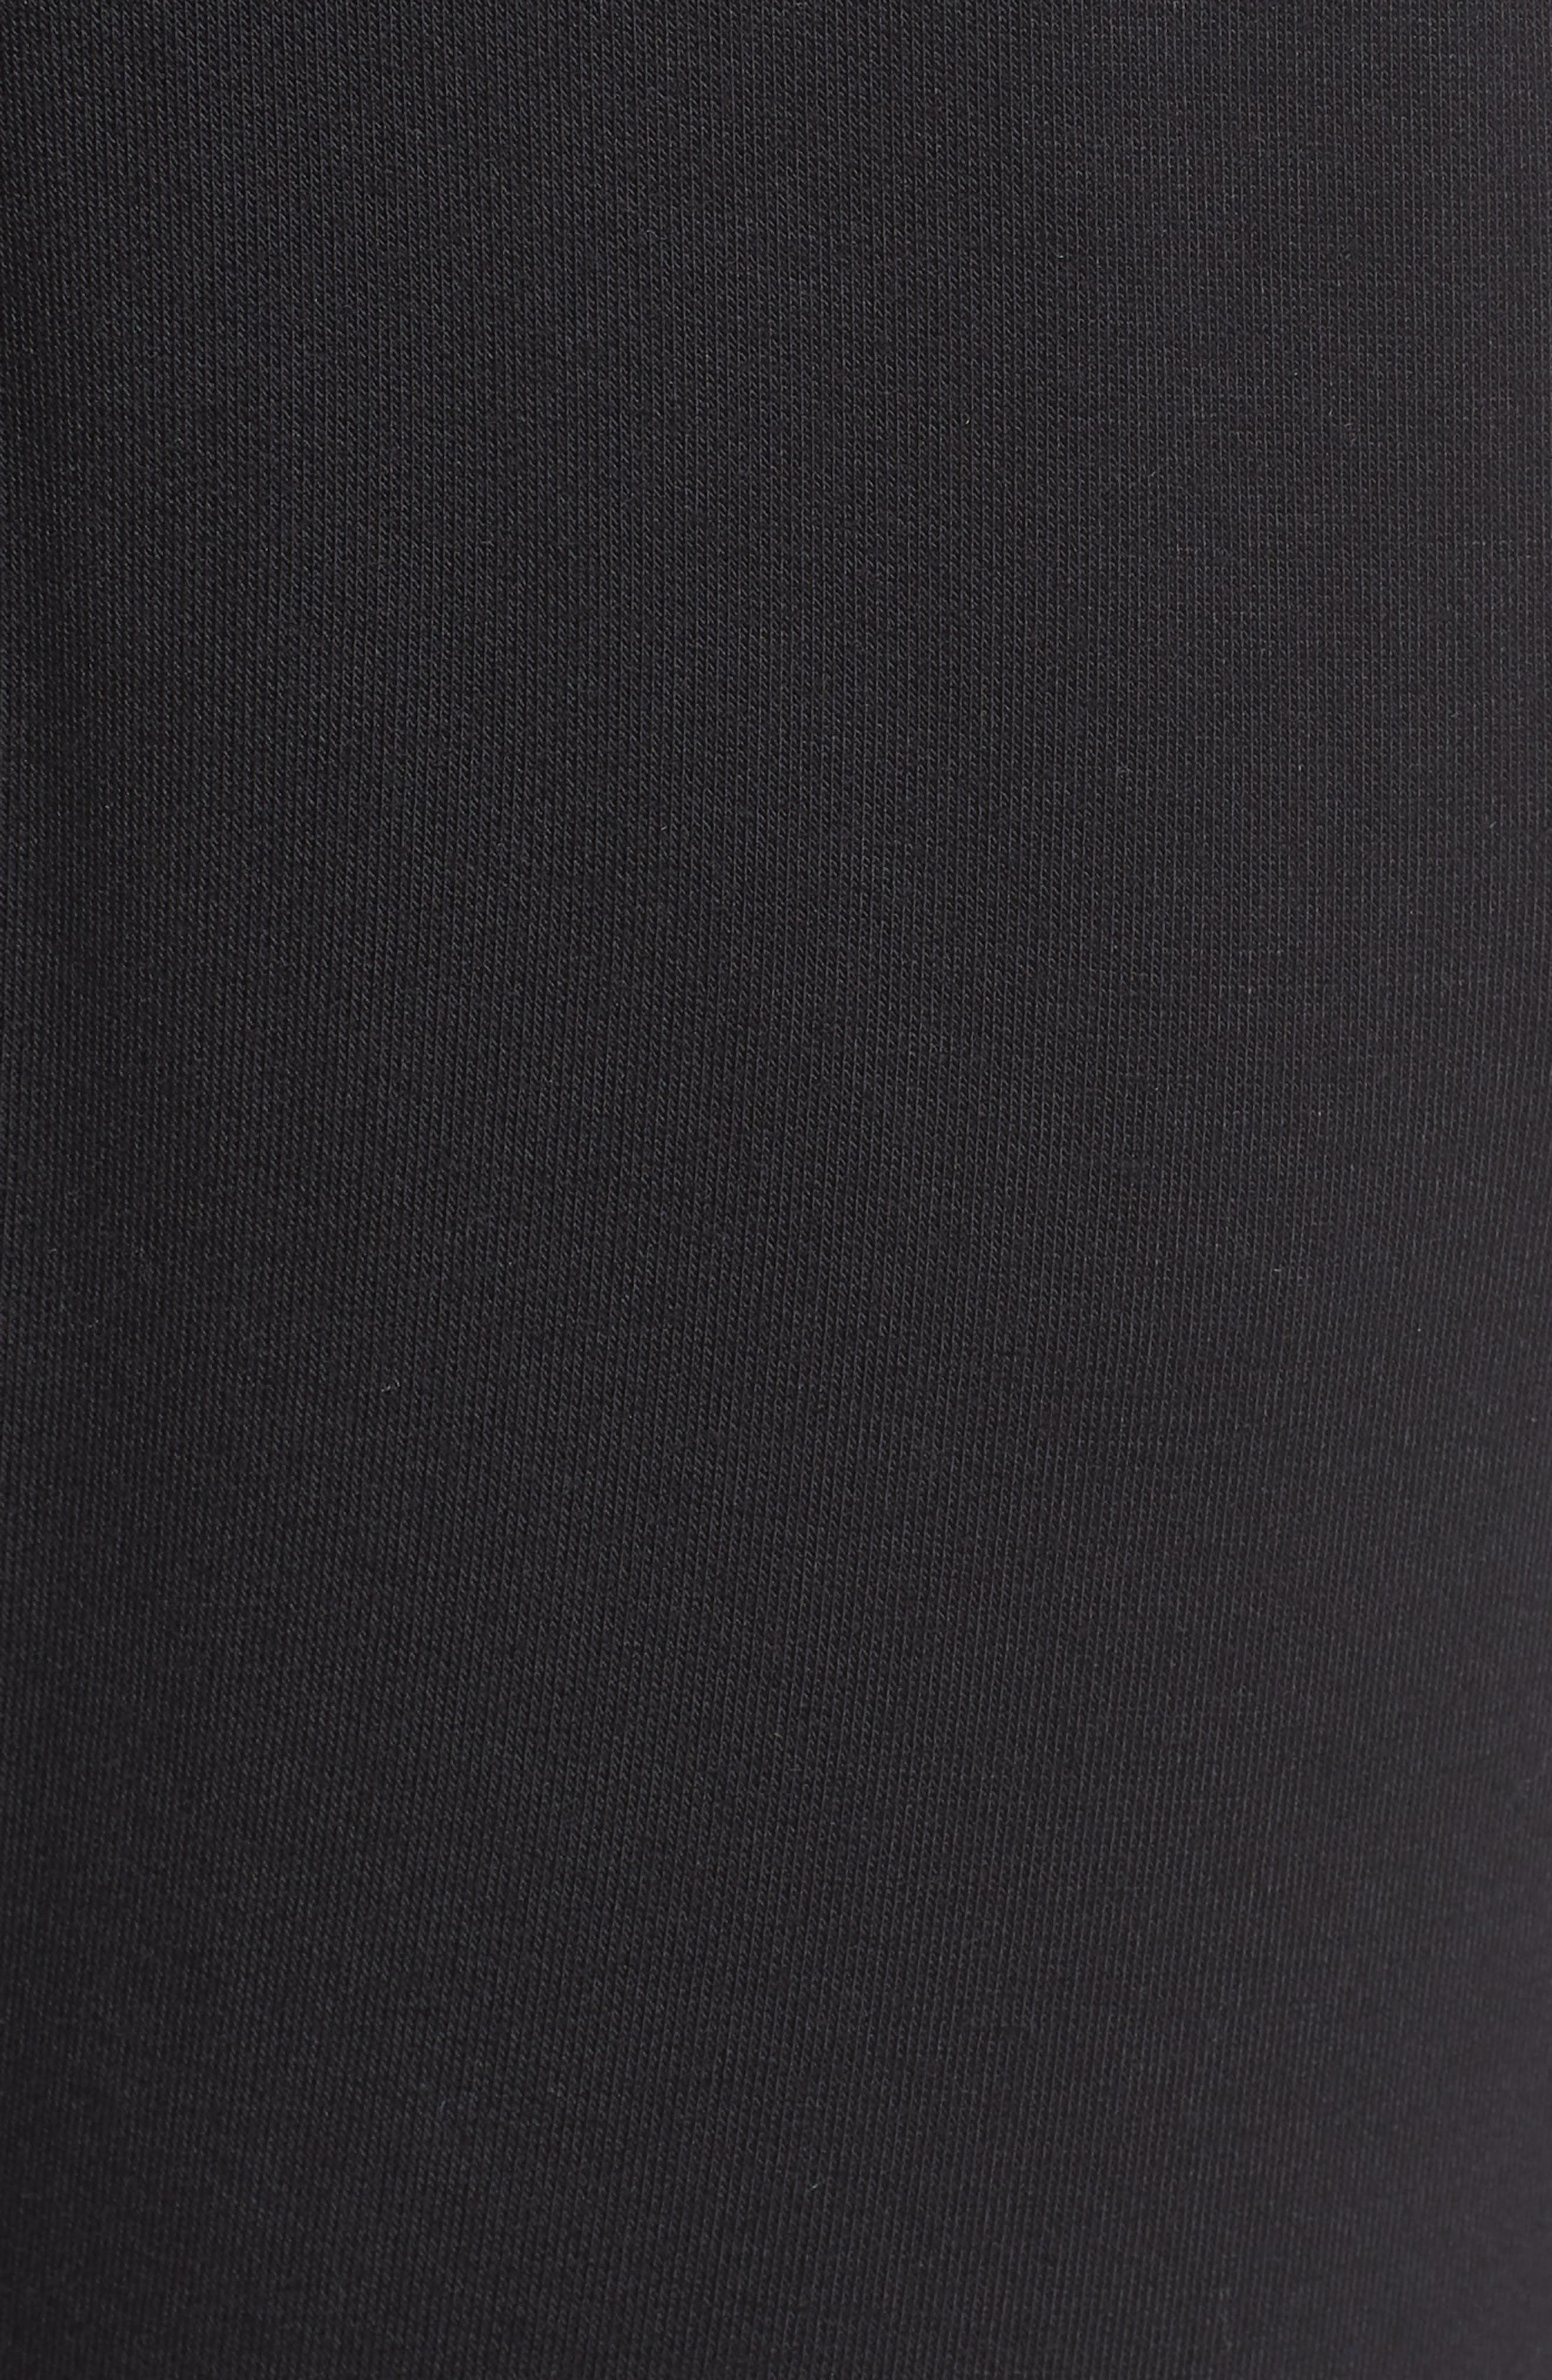 Lounge Pants,                             Alternate thumbnail 5, color,                             BLACK